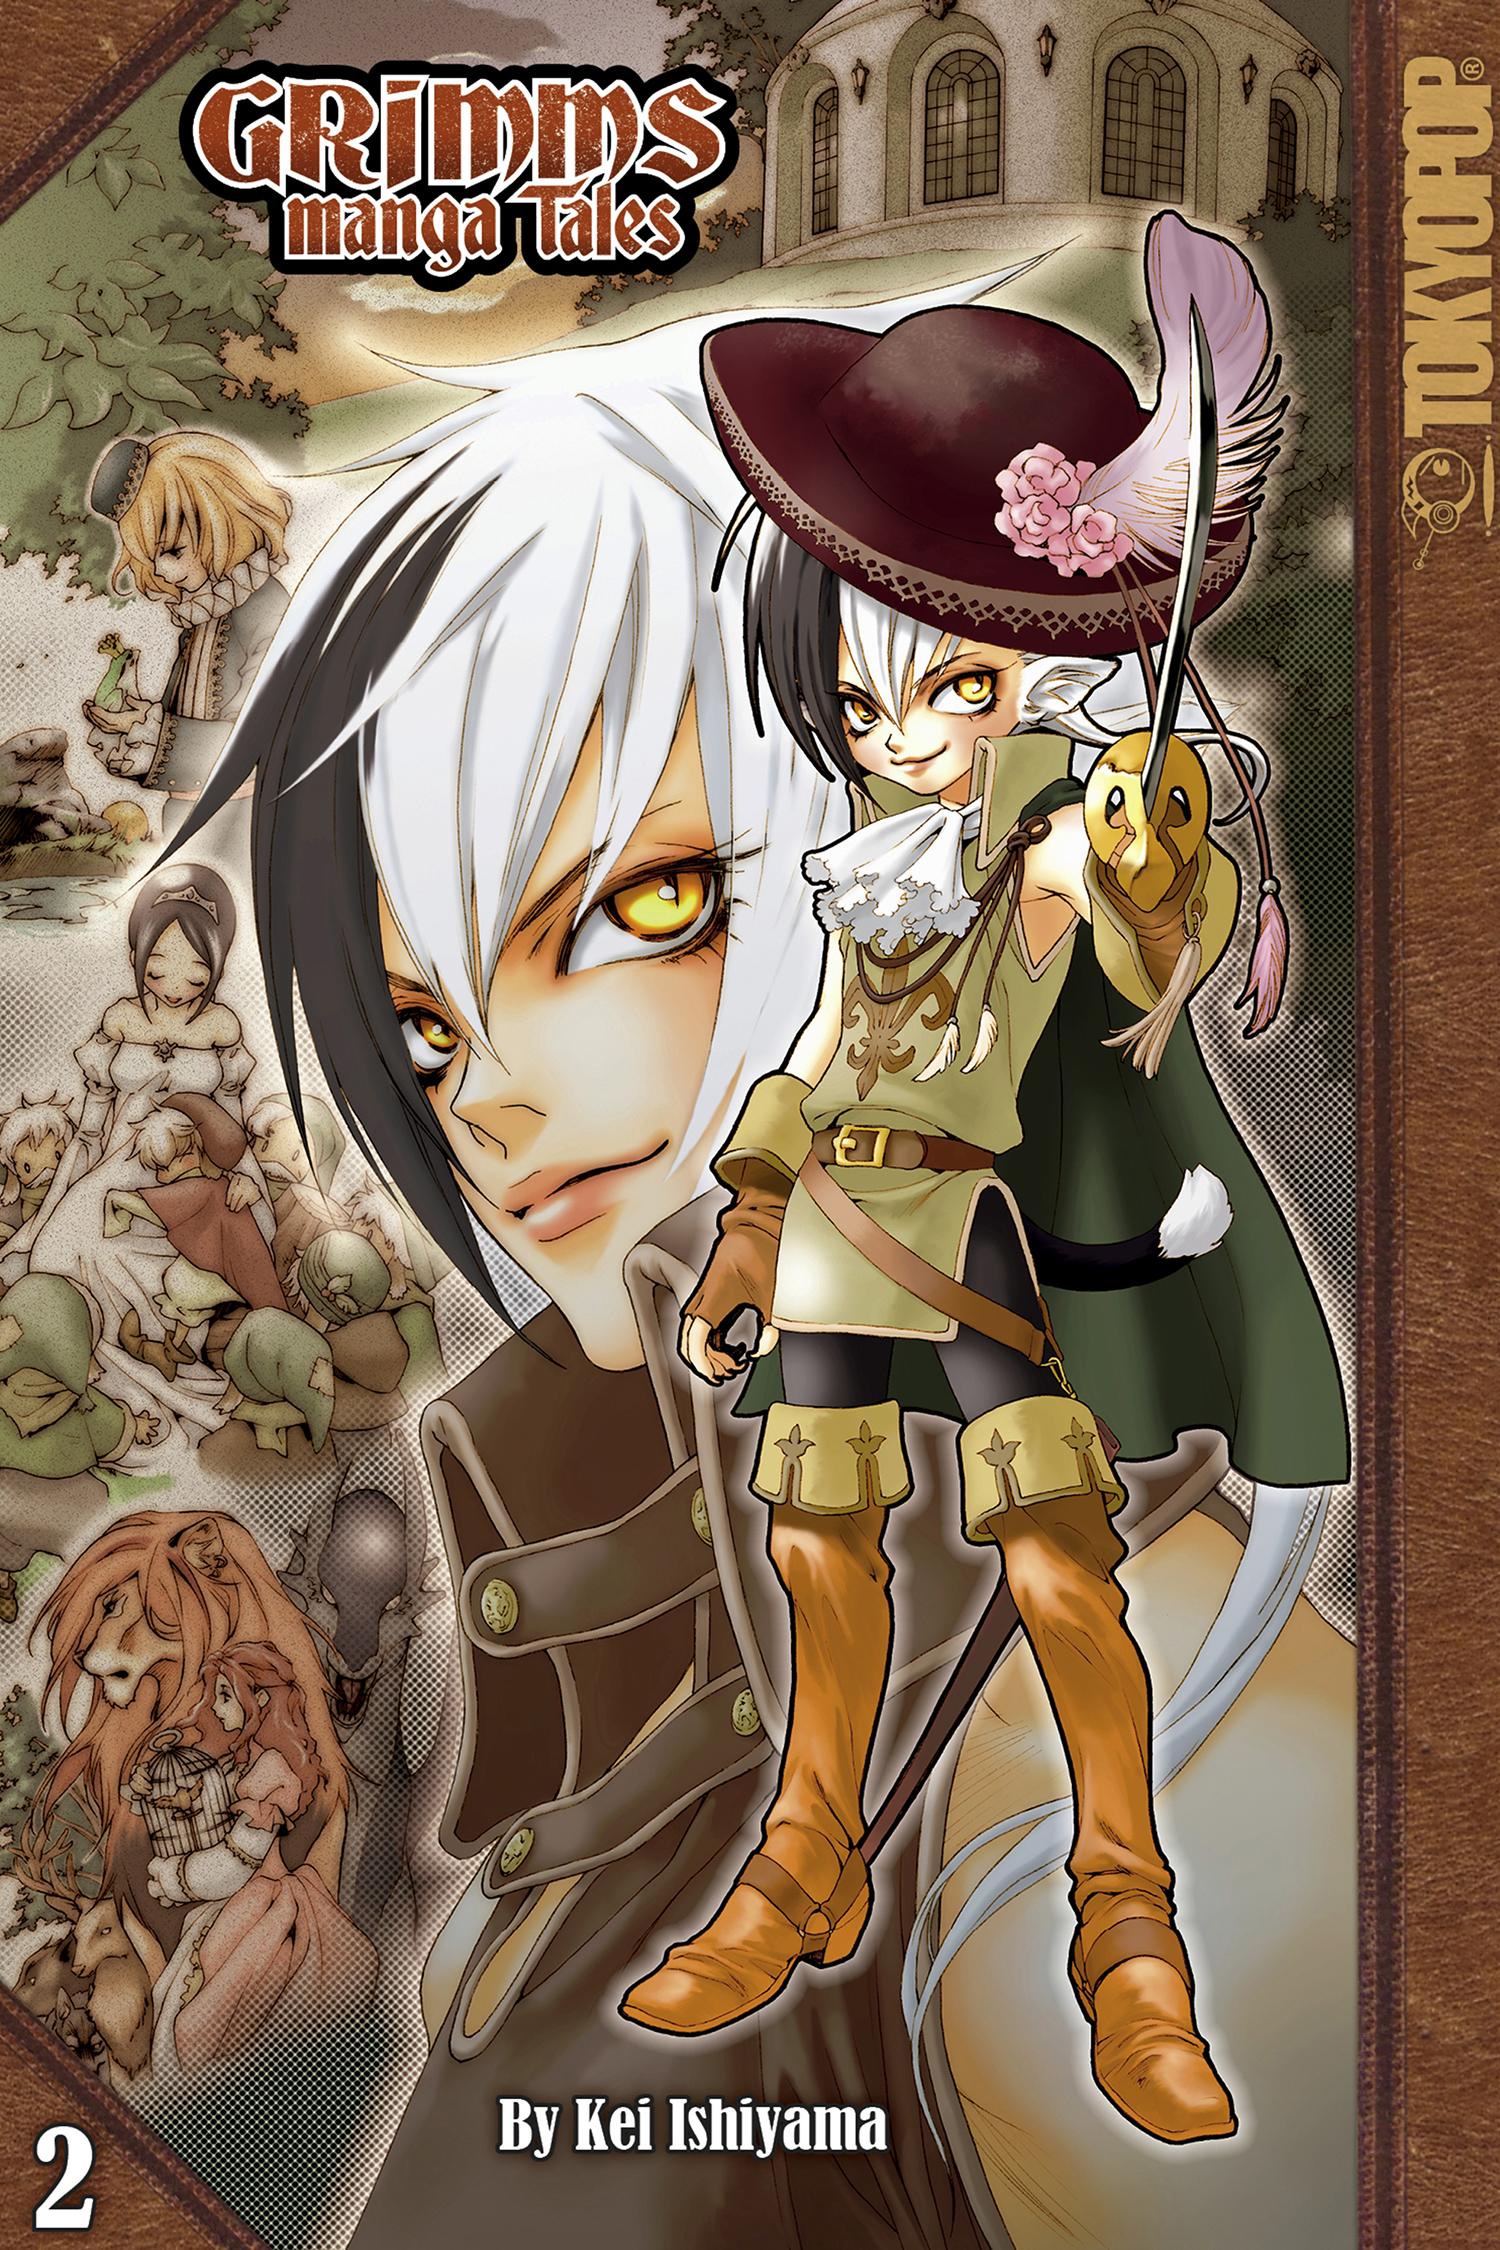 Grimms Manga Tales, Vol. 2 (ebook version)